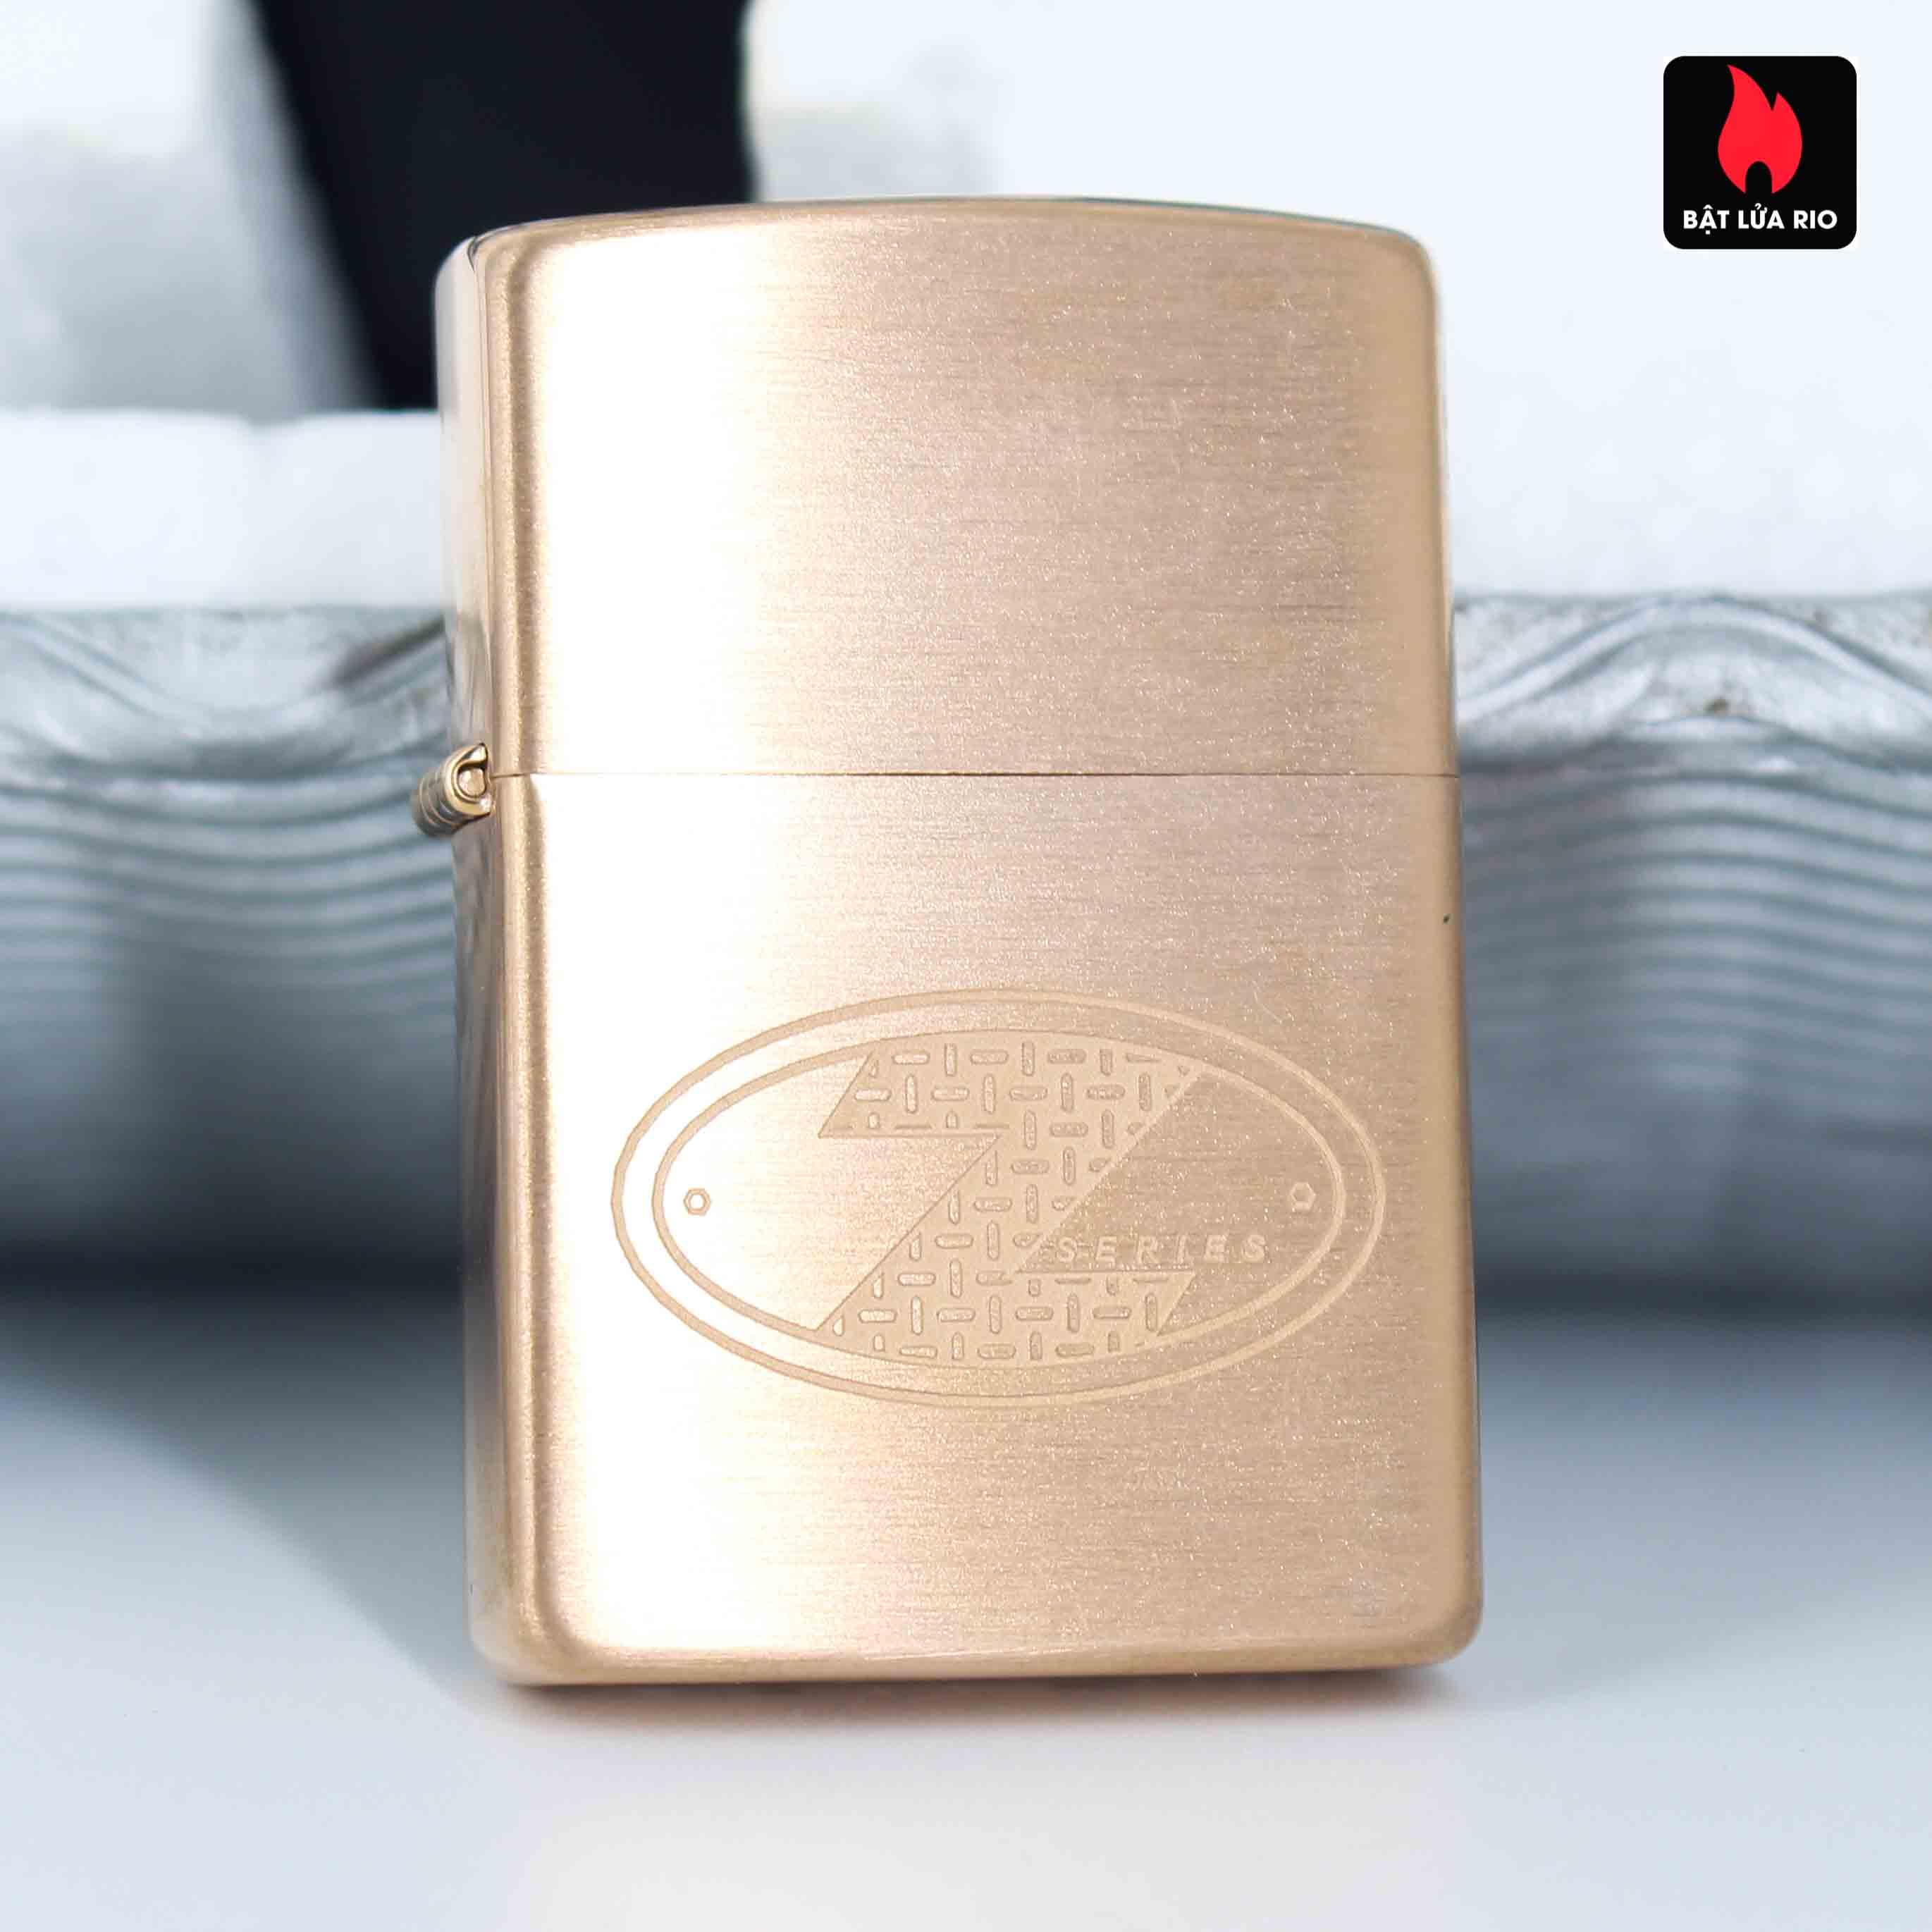 Zippo 2002 – Zippo Z-Series Copper Project – USA - Limited 03605/10188 A 7